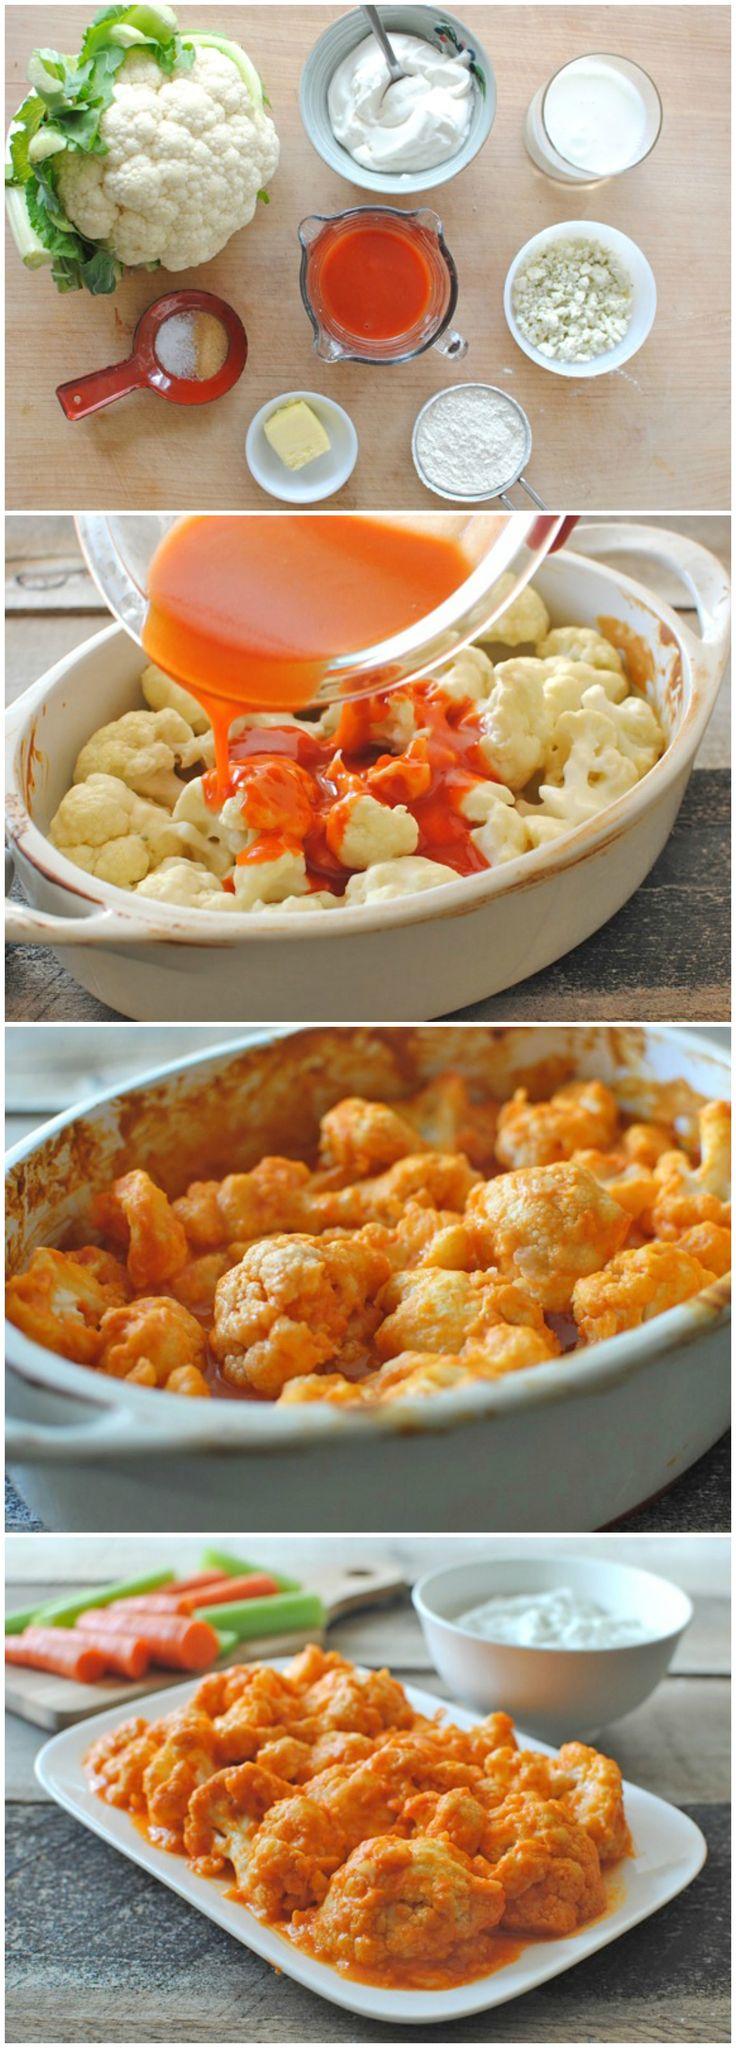 Buffalo Cauliflower w/ Yogurt Dipping Sauce omit flour